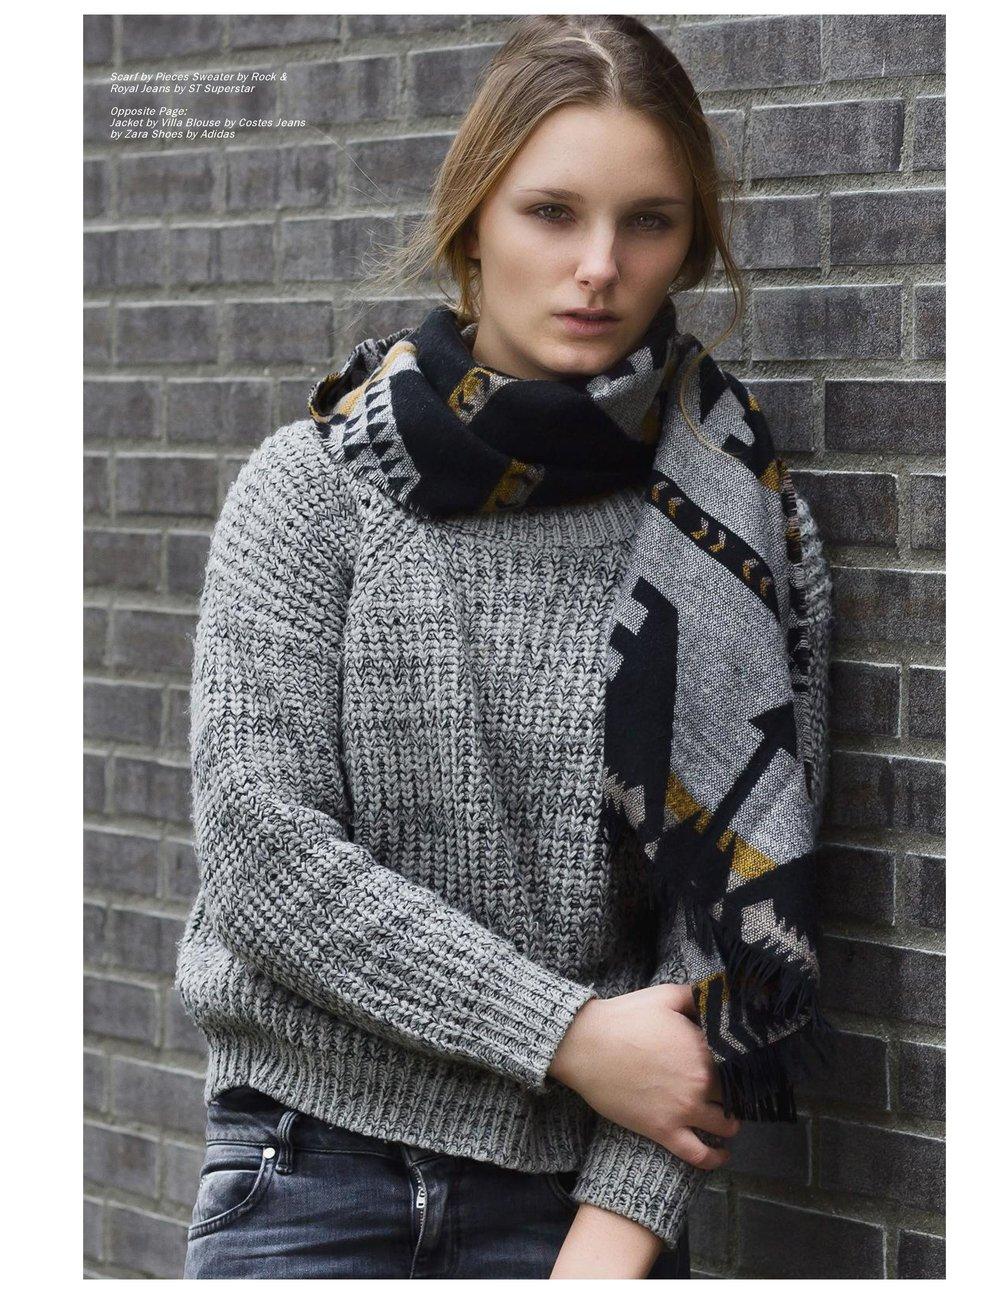 December_2015_Fashion_1_December_2015_-page-018.jpg